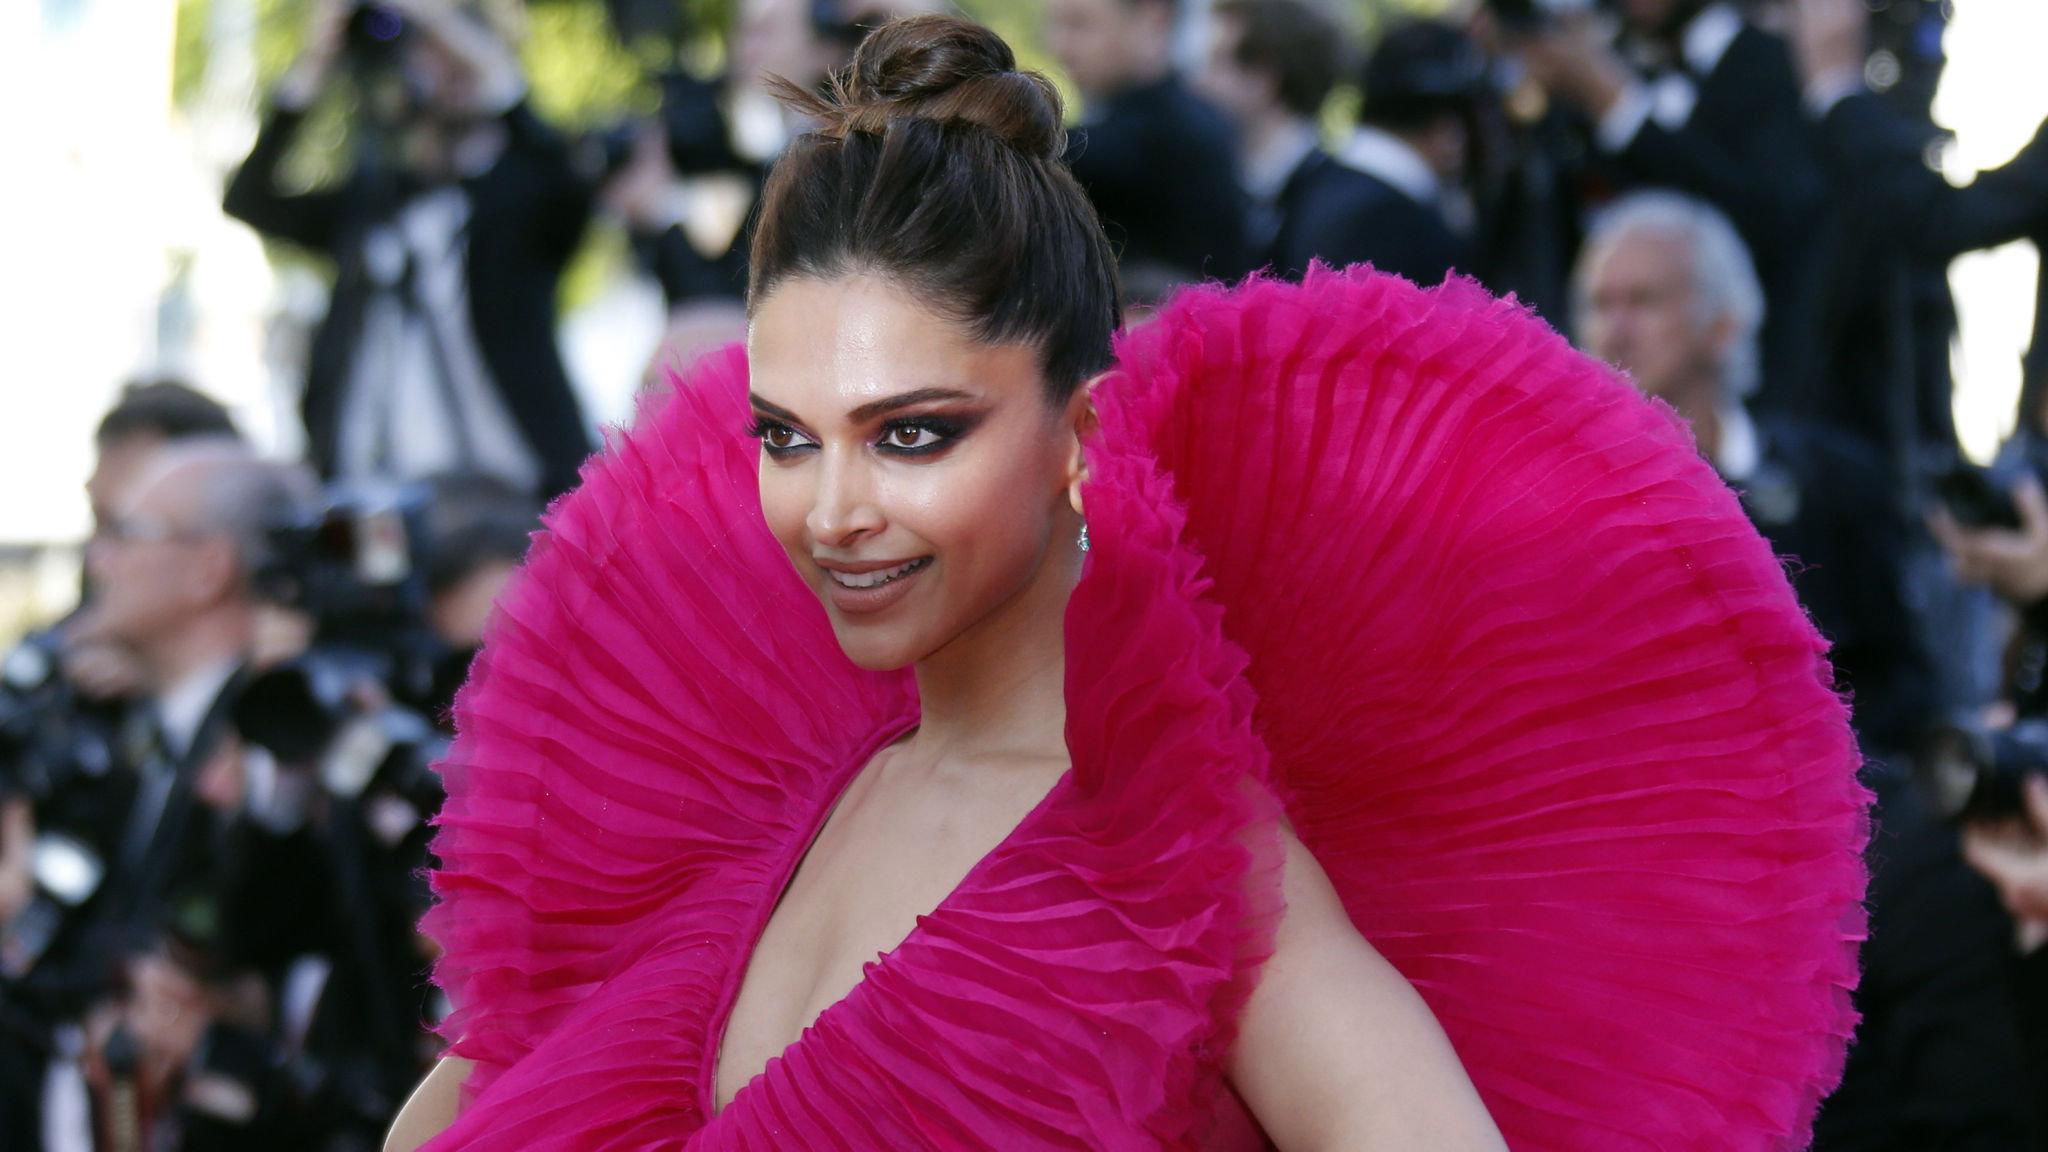 Deepika Padukone A Star Shines A Light On Dark Truths Financial Times